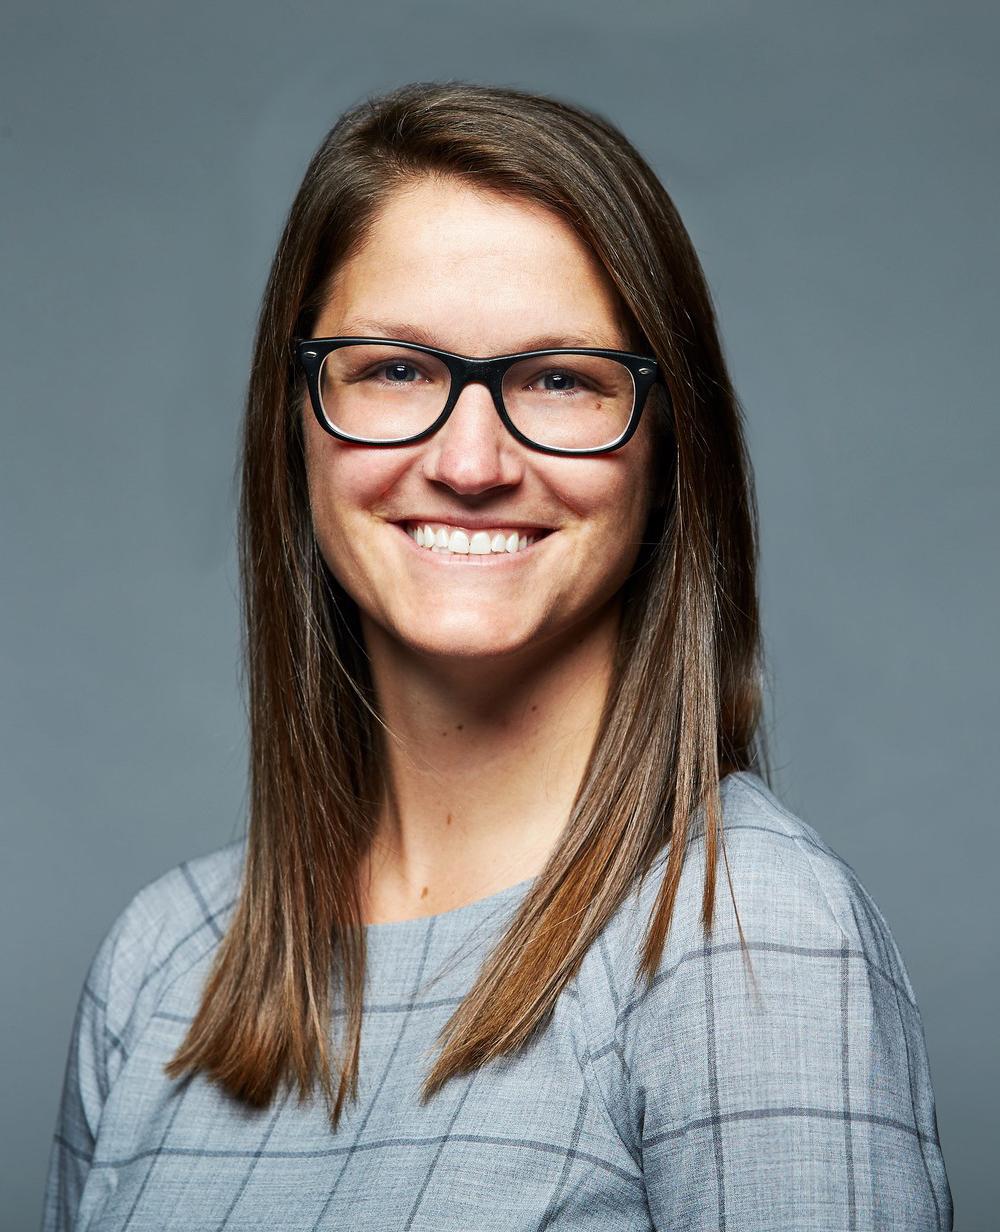 Katie Weimer